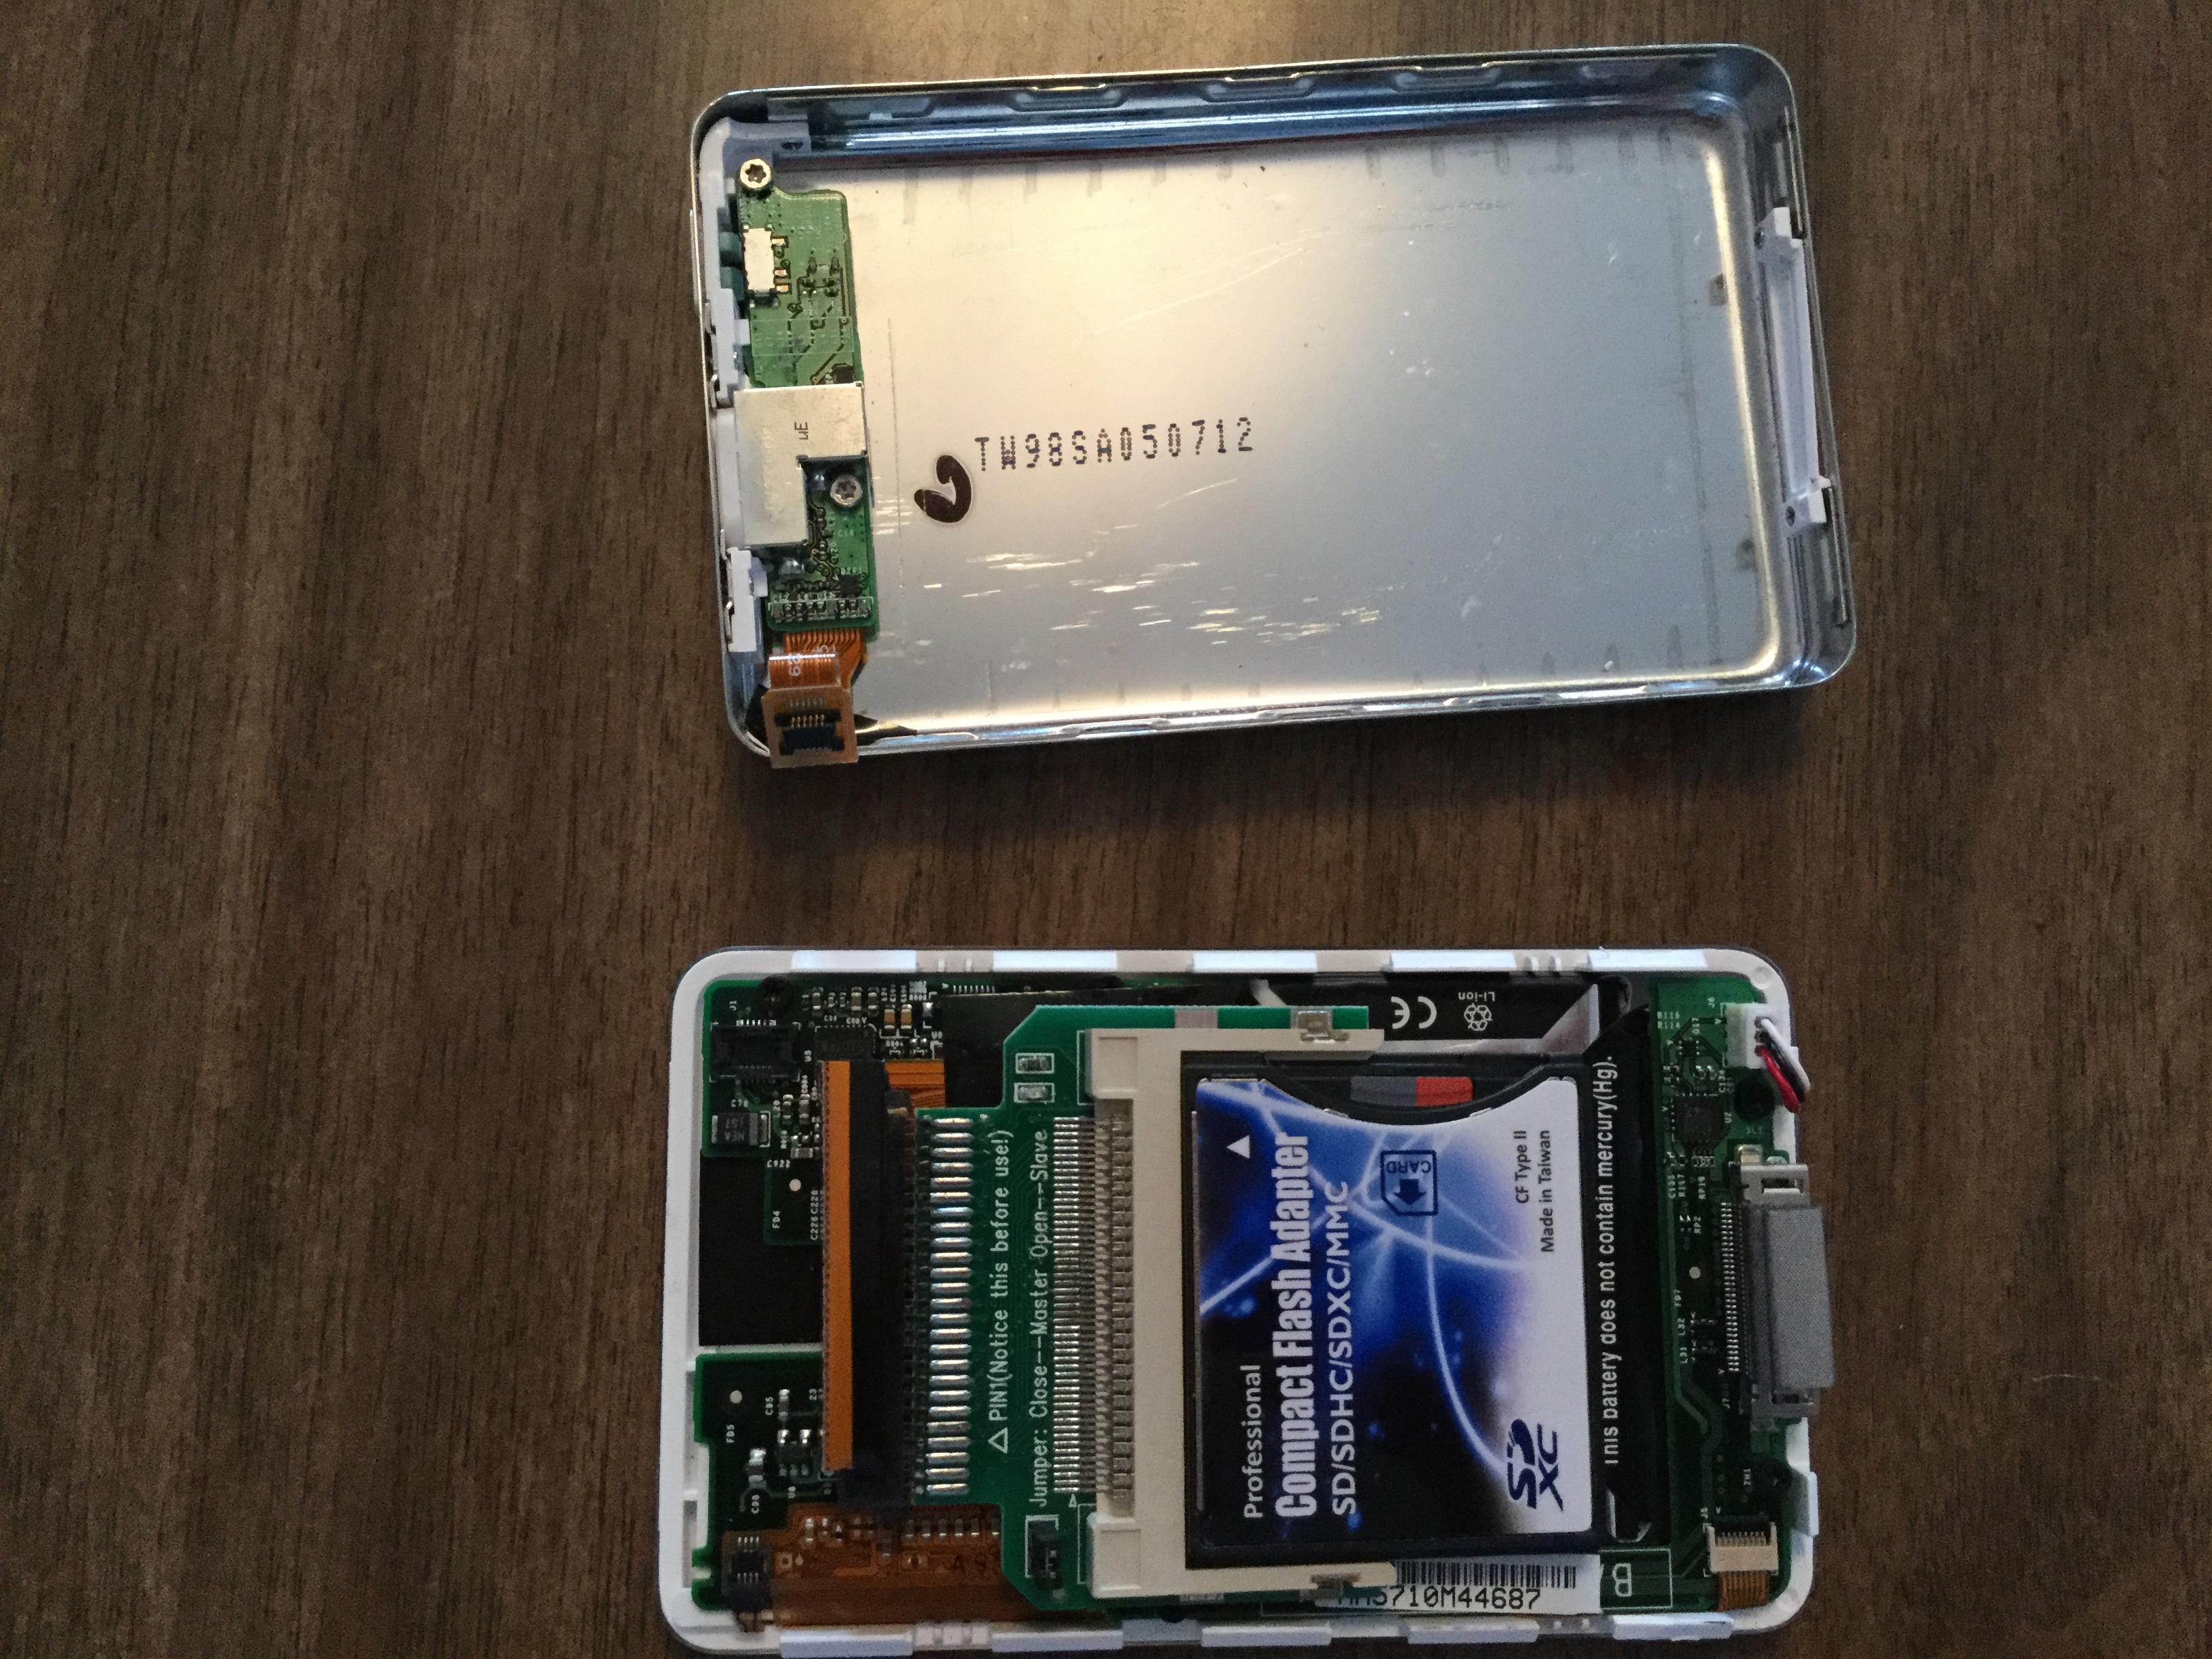 iPod Classic 4th Gen SSD Upgrade Adventure | MacRumors Forums